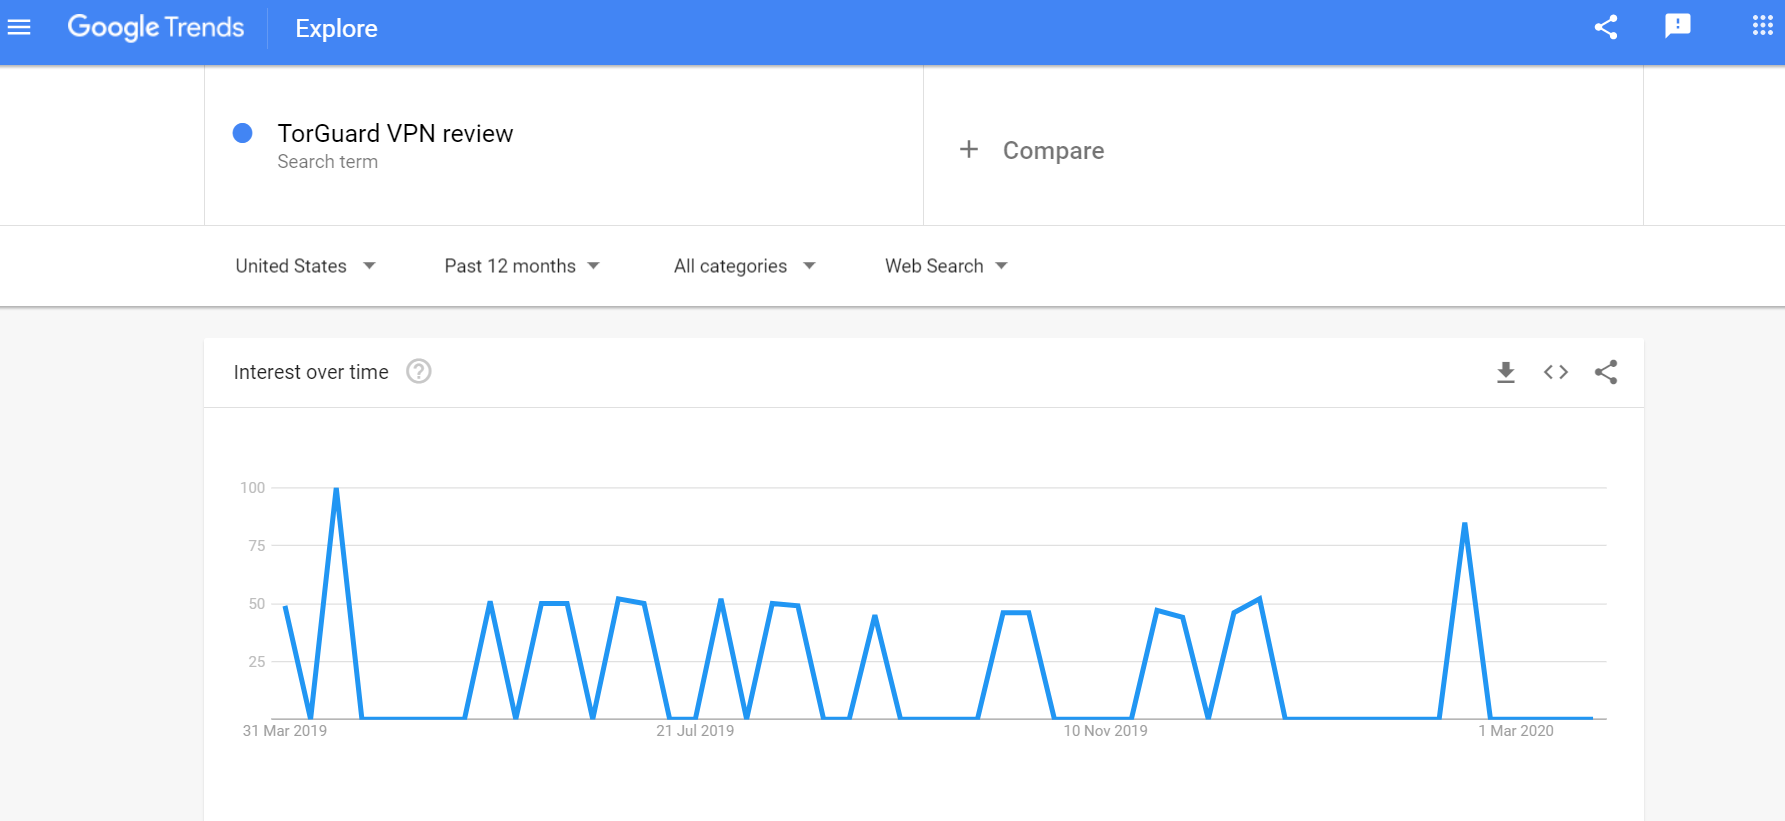 TorGuard VPN Review Google trends